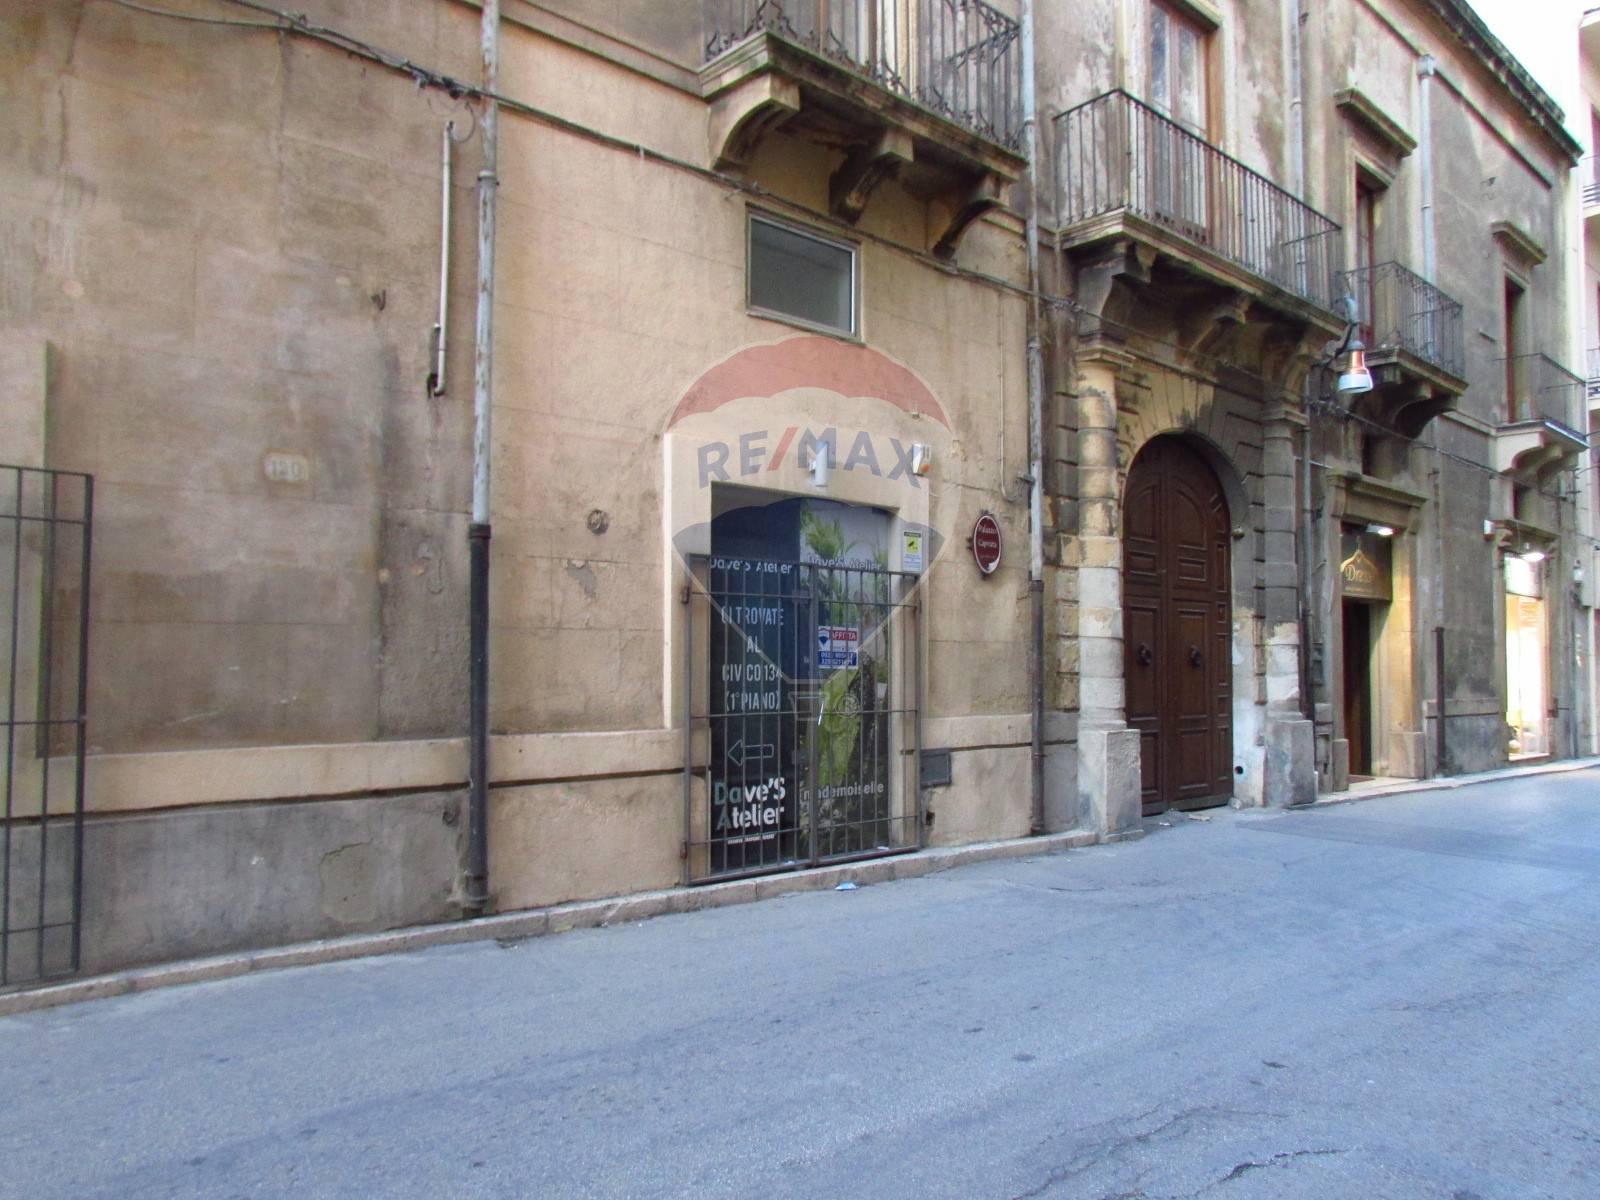 FONDO COMMERCIALE in Affitto a Sciacca (AGRIGENTO)